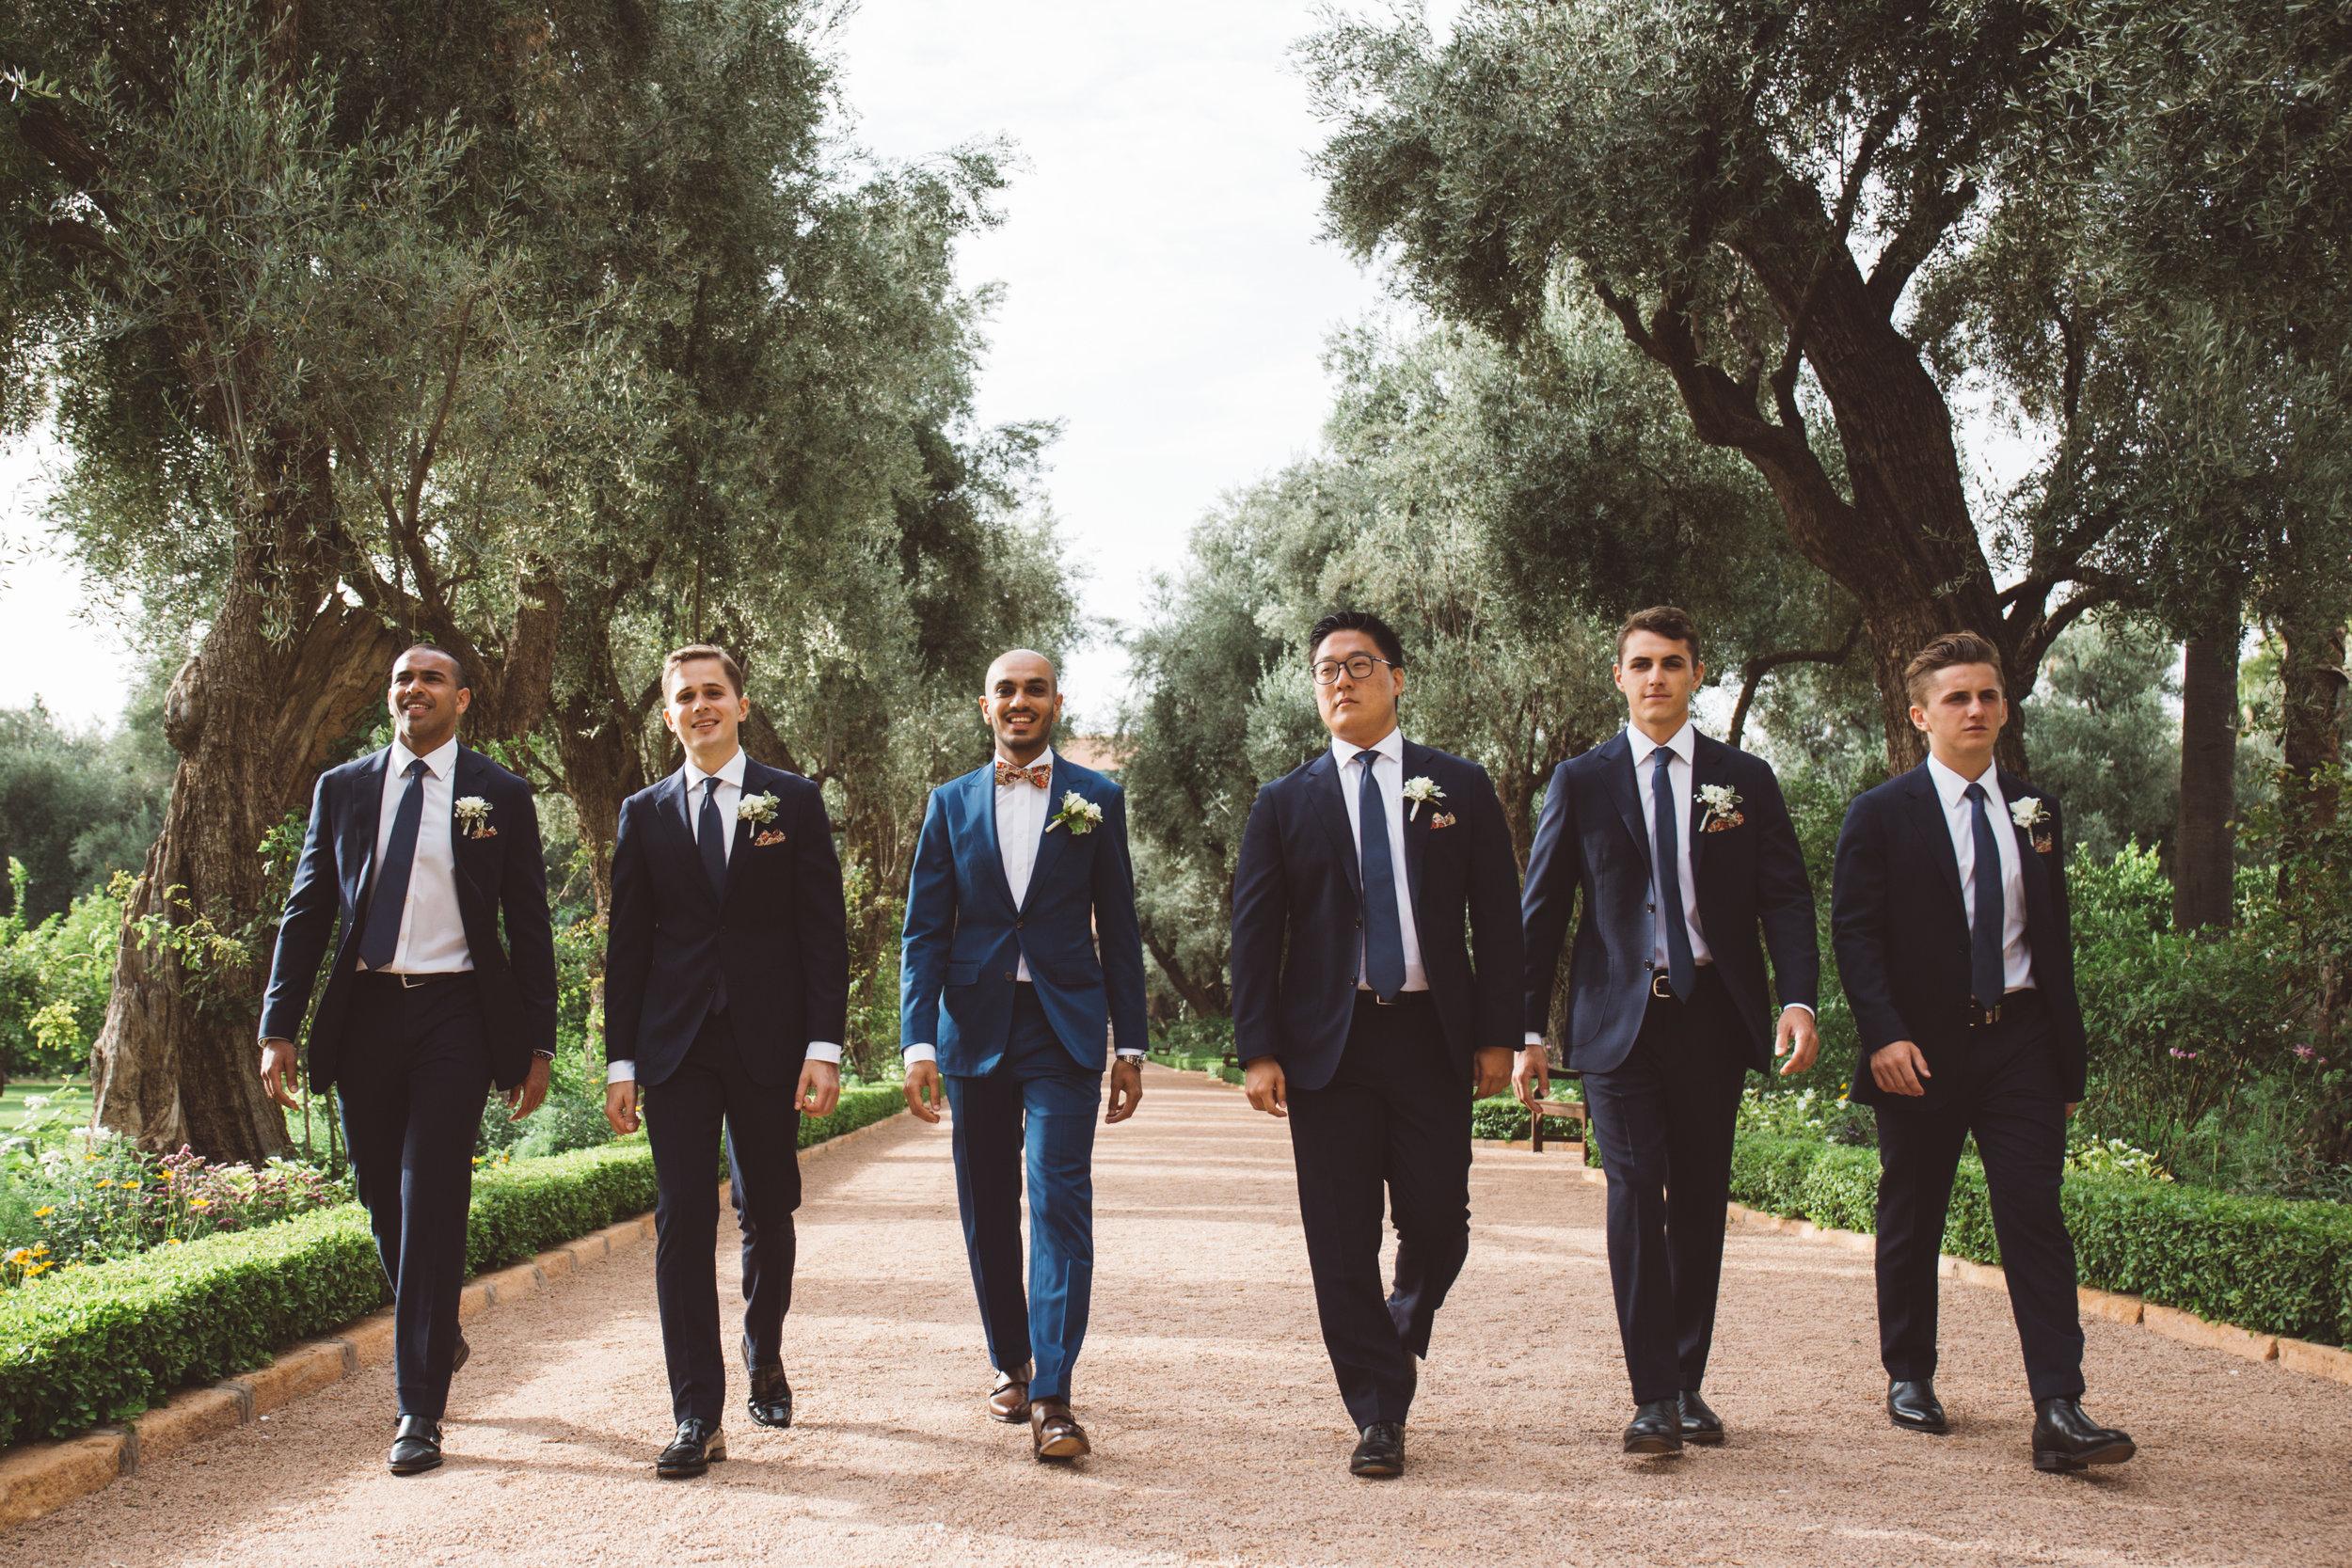 groomsmen all walk in a line towards the outdoor wedding ceremony at la mamounia hotel in marrakech morocco